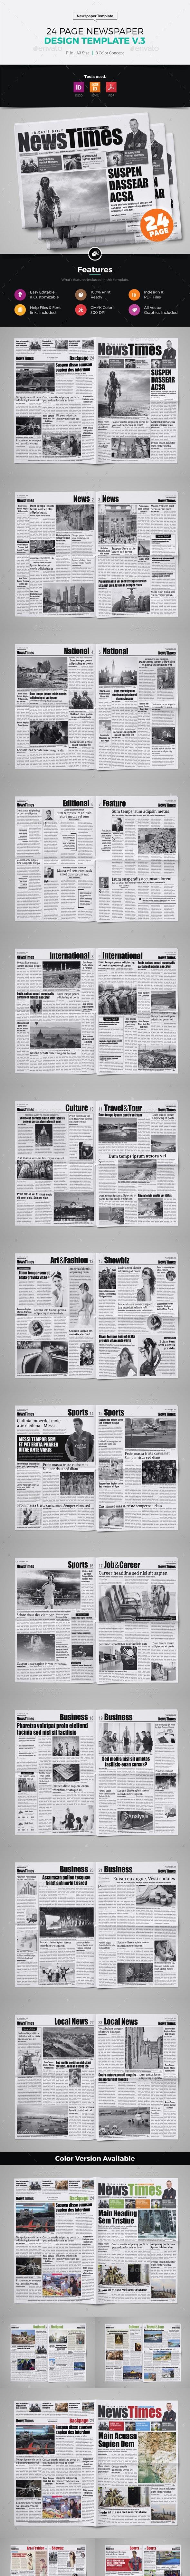 24 Page Newspaper Design v3 - Newsletters Print Templates